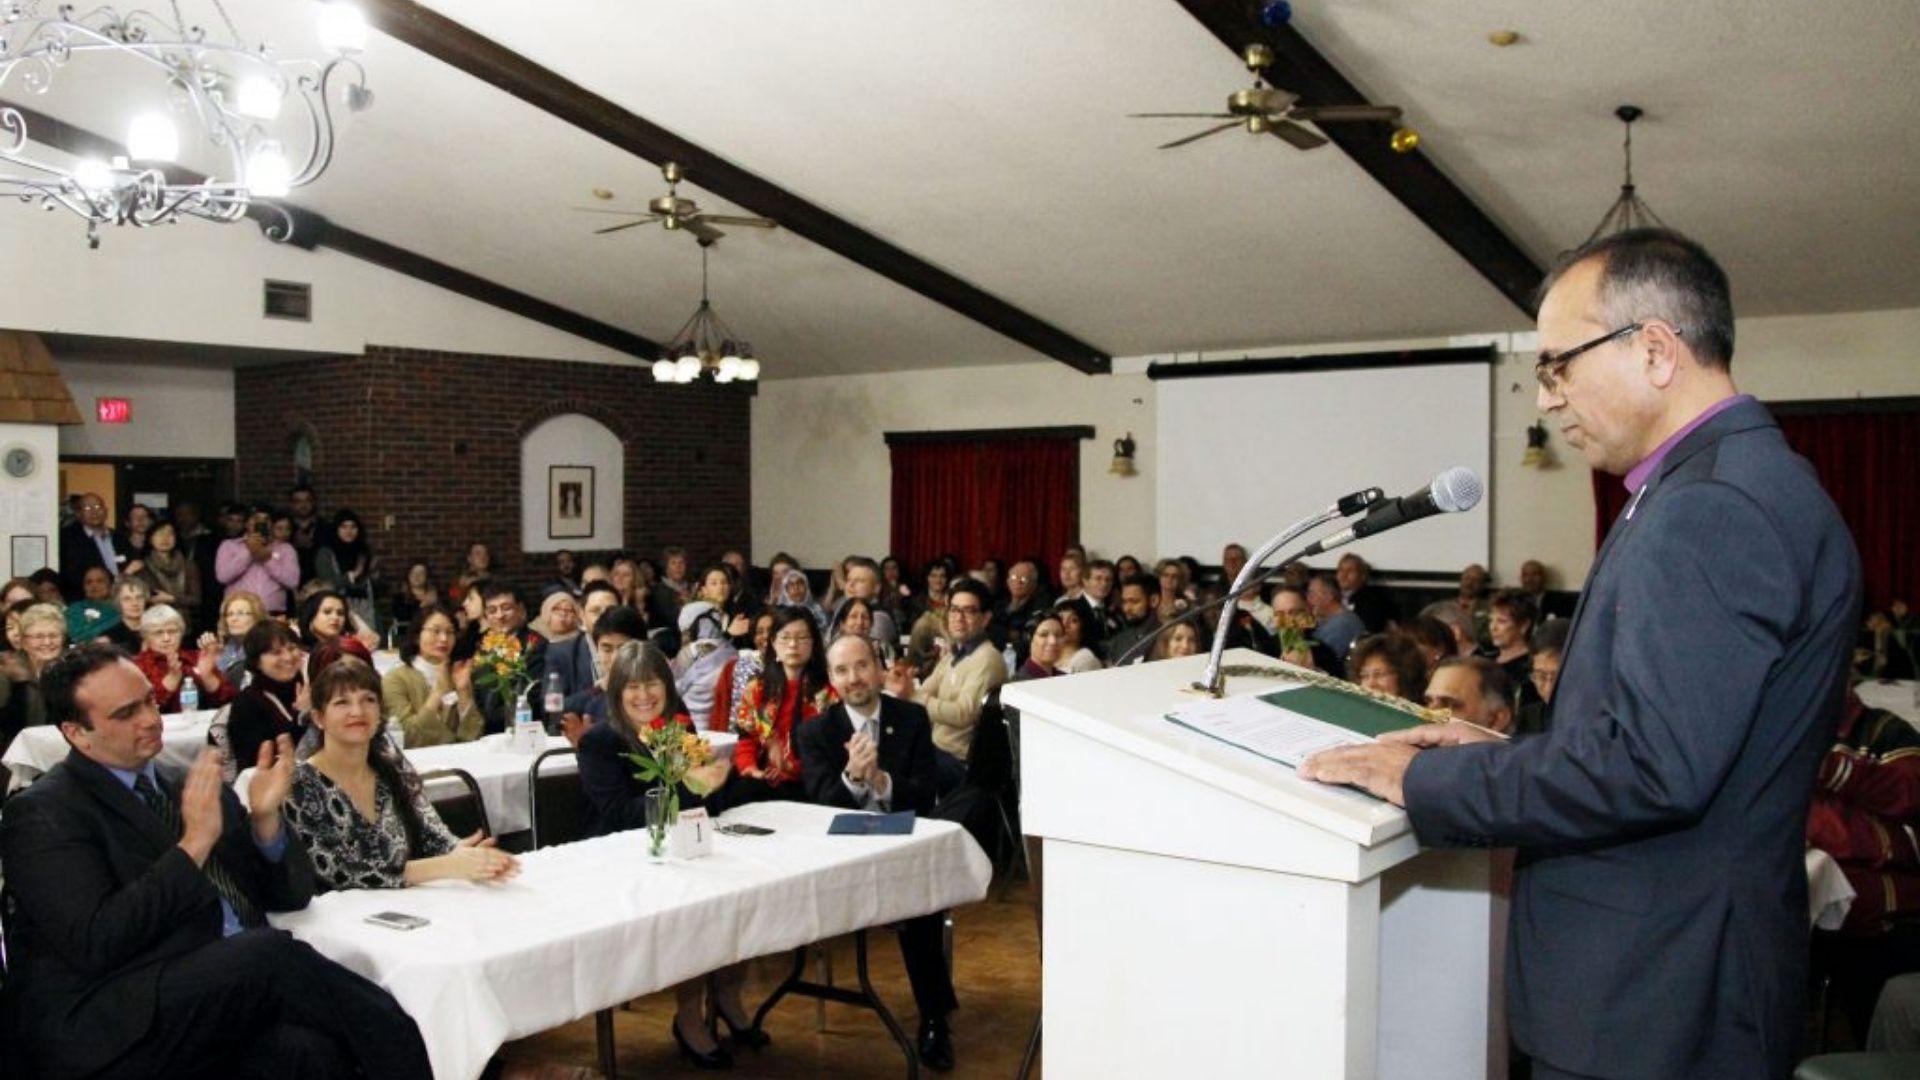 Annual Diversity Community Dinner